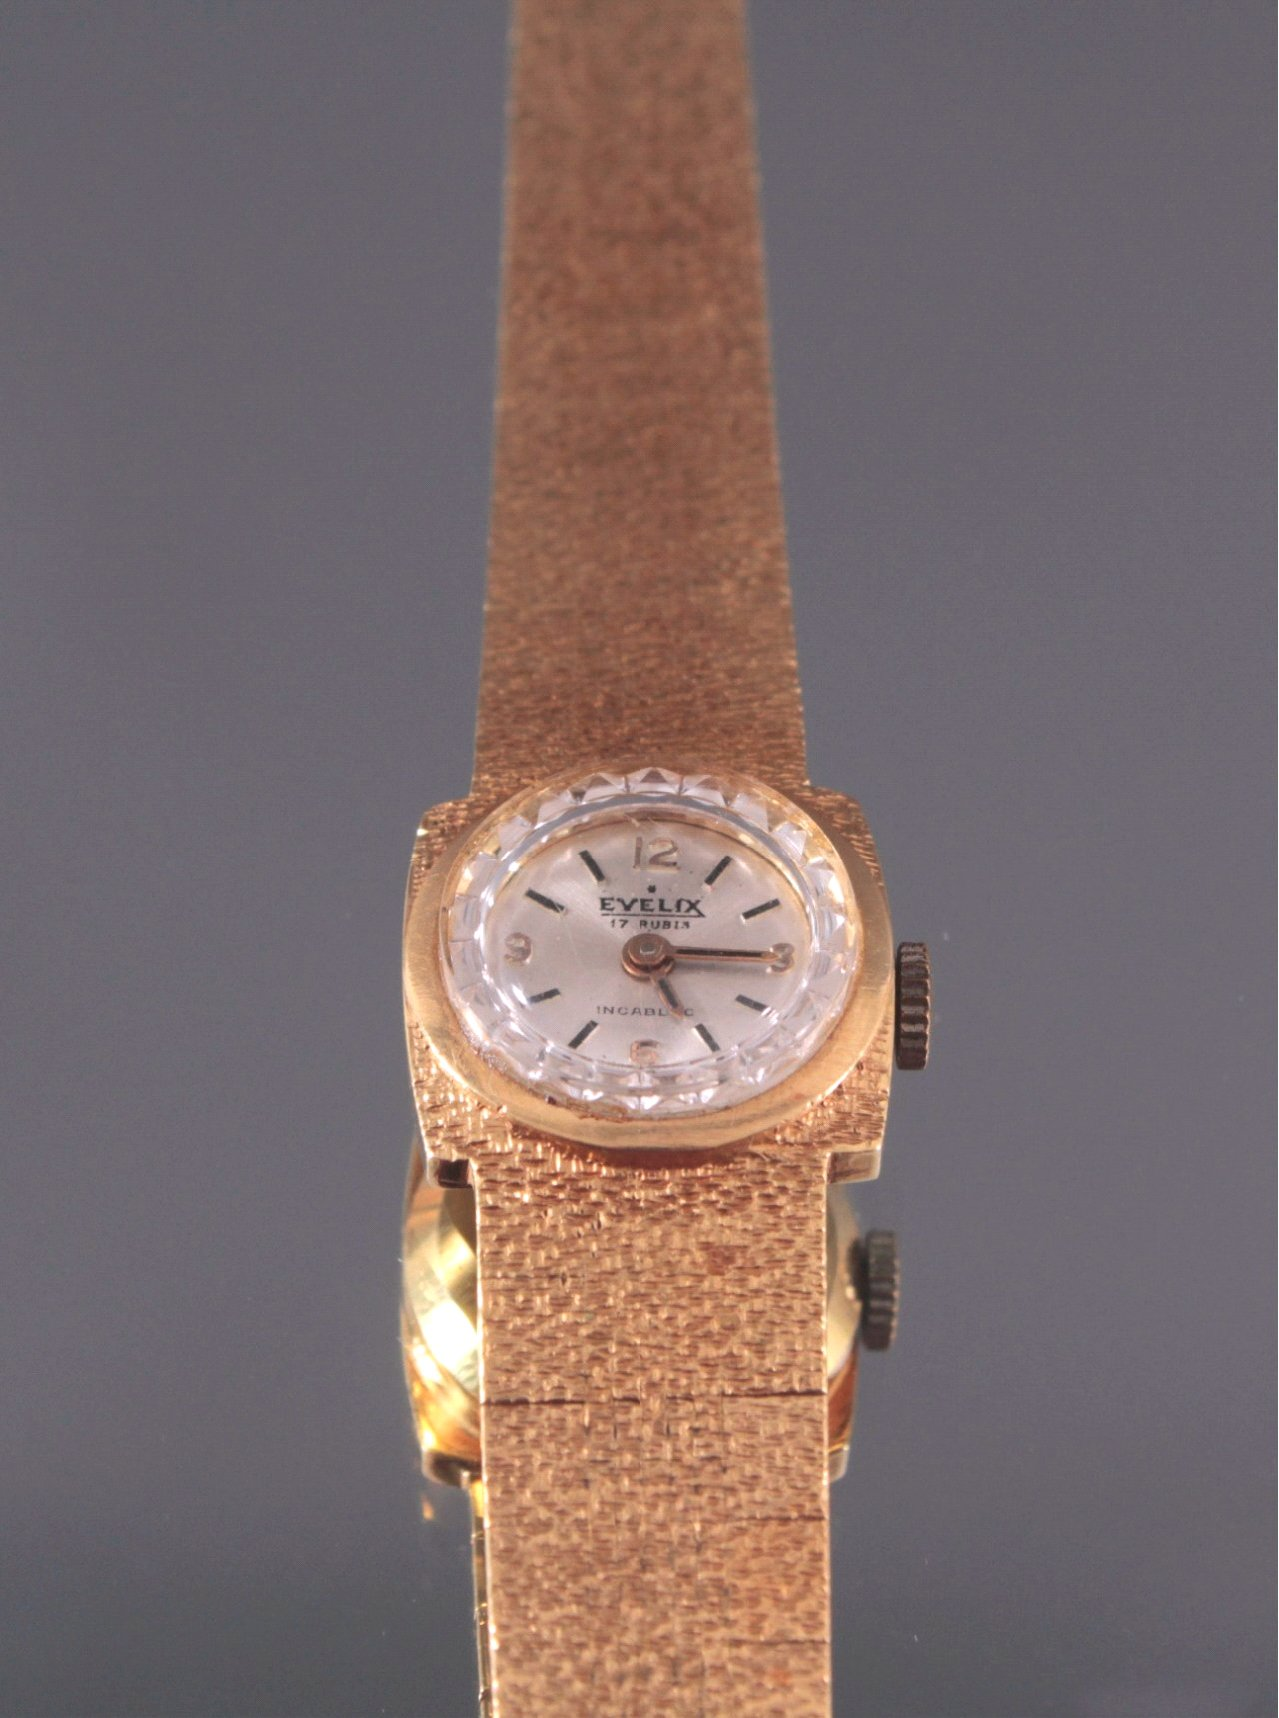 Damenarmbanduhr Evelix, 750/000 Gelb Gold-2